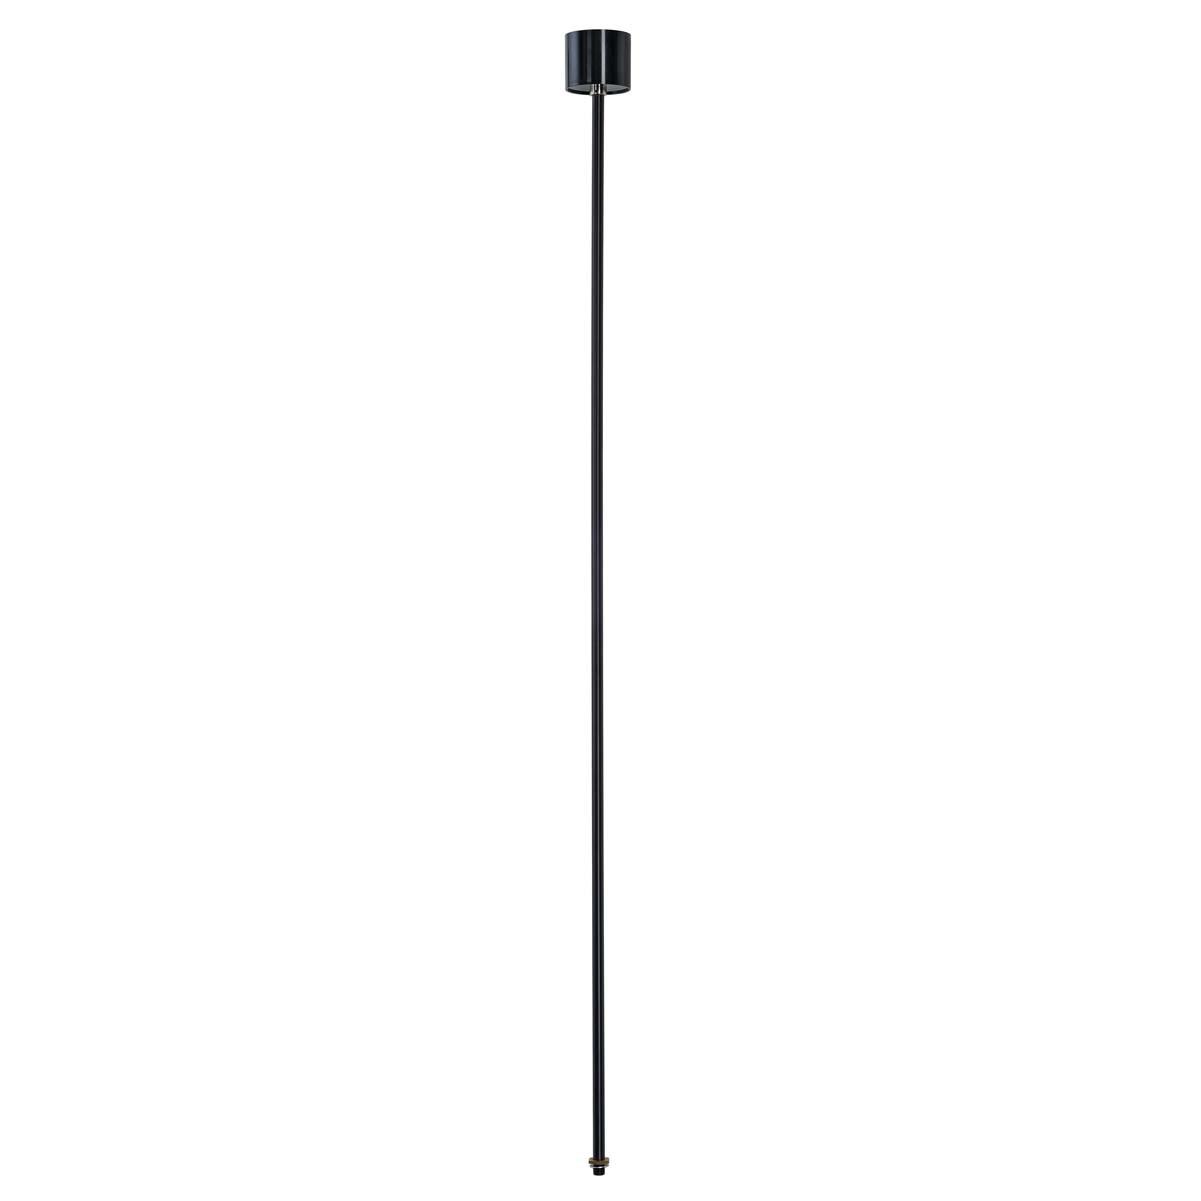 SLV 145710 Pendant Suspension 1.2m Black Eutrac 3 Circuit 240V Surface Track Accessory